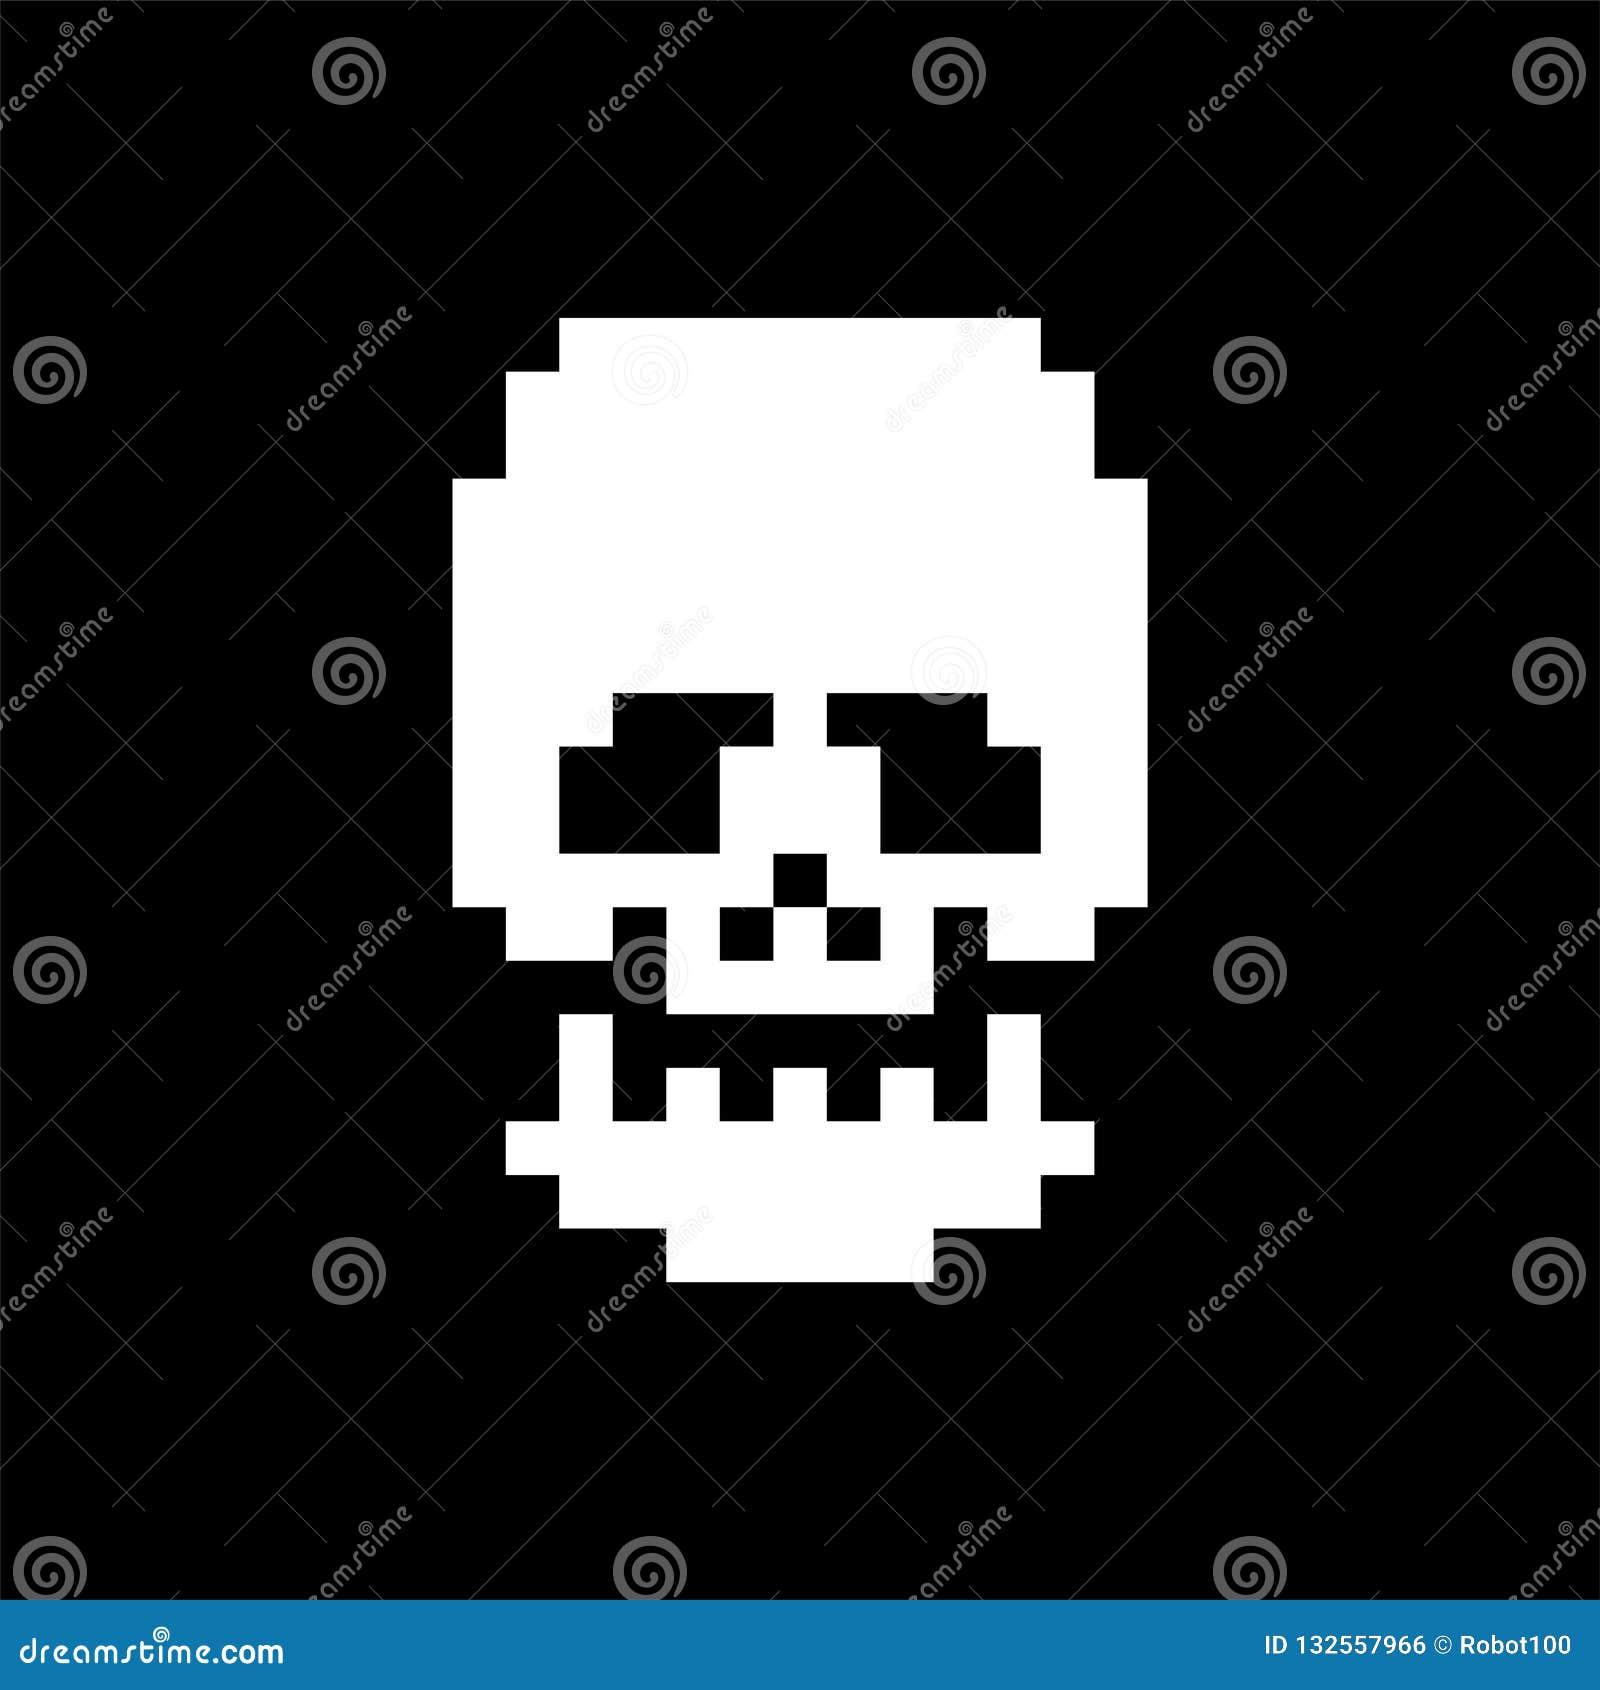 Skull Pixel Art  Bones Anatomy 8 Bit  Pixelate Human Skeleton System